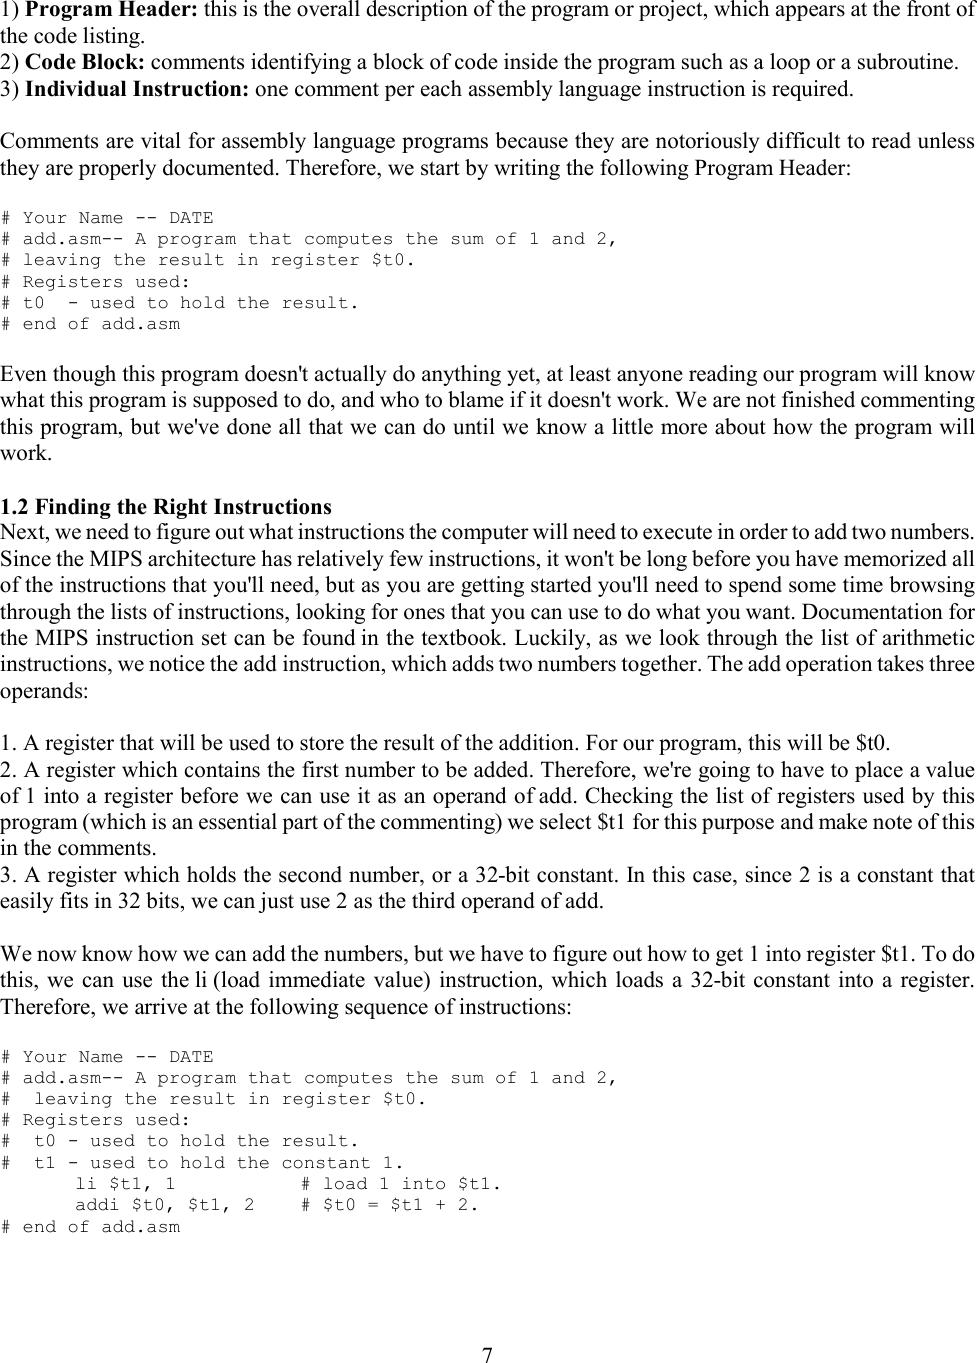 EEL4768 Lab1 Instructions